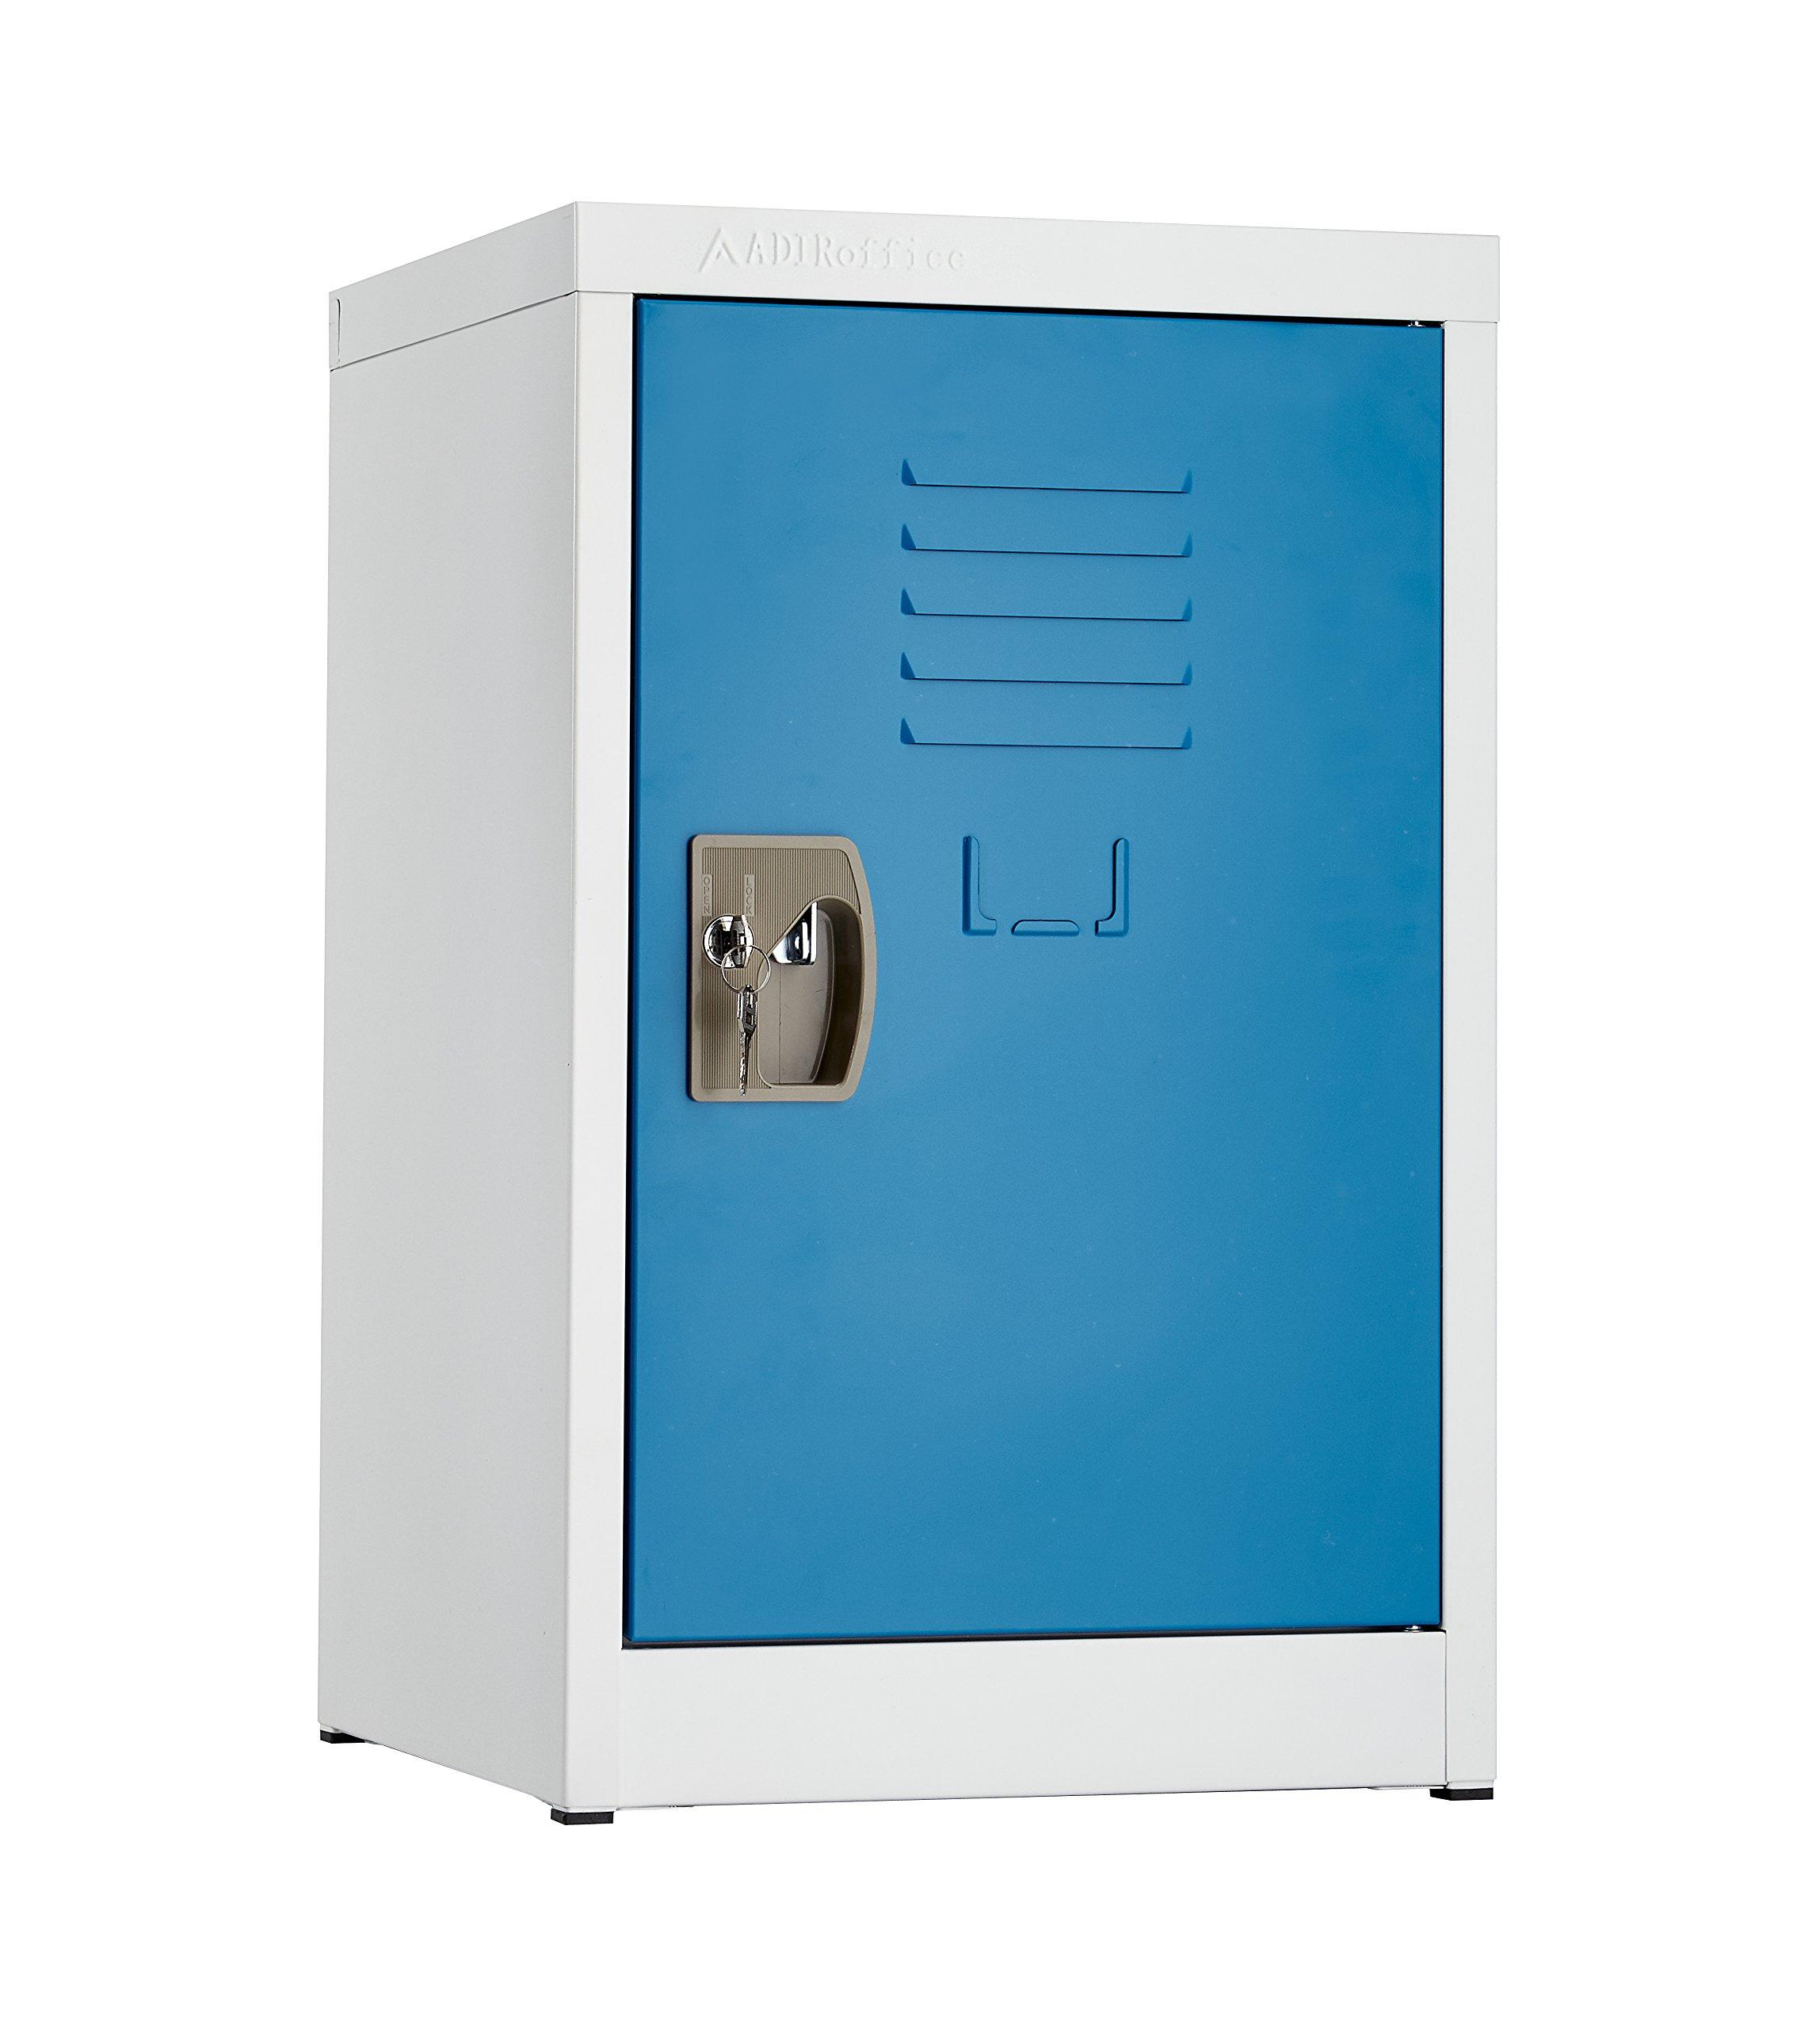 AdirOffice Kids Steel Metal Storage Locker - For Home & School - With Key & Hanging Rods (24 Inch, Blue)